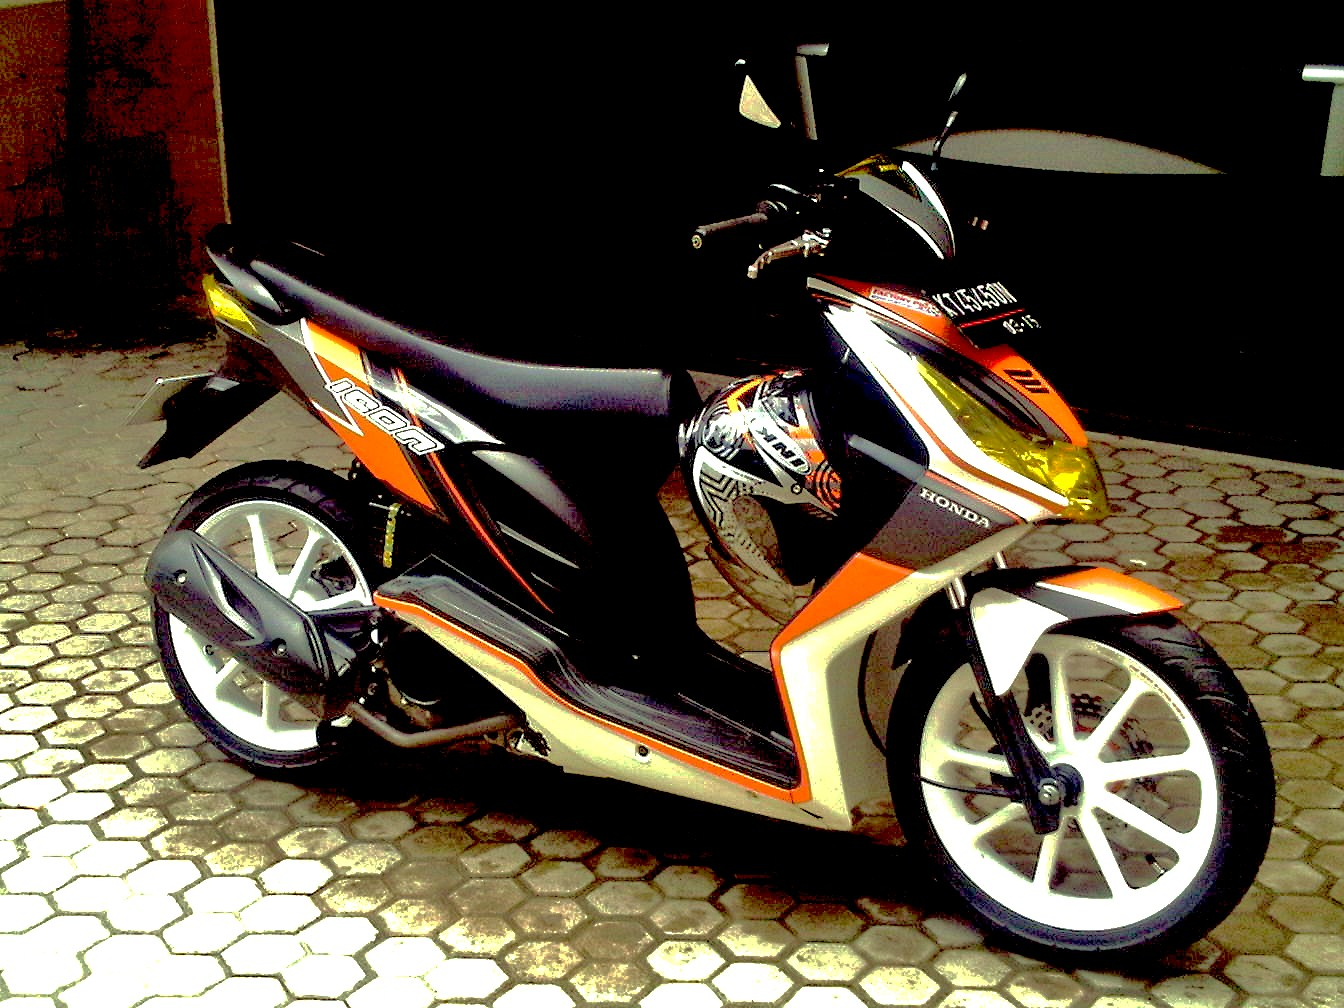 Gambar Modifikasi Motor Honda BeAT FI Terkeren 2016